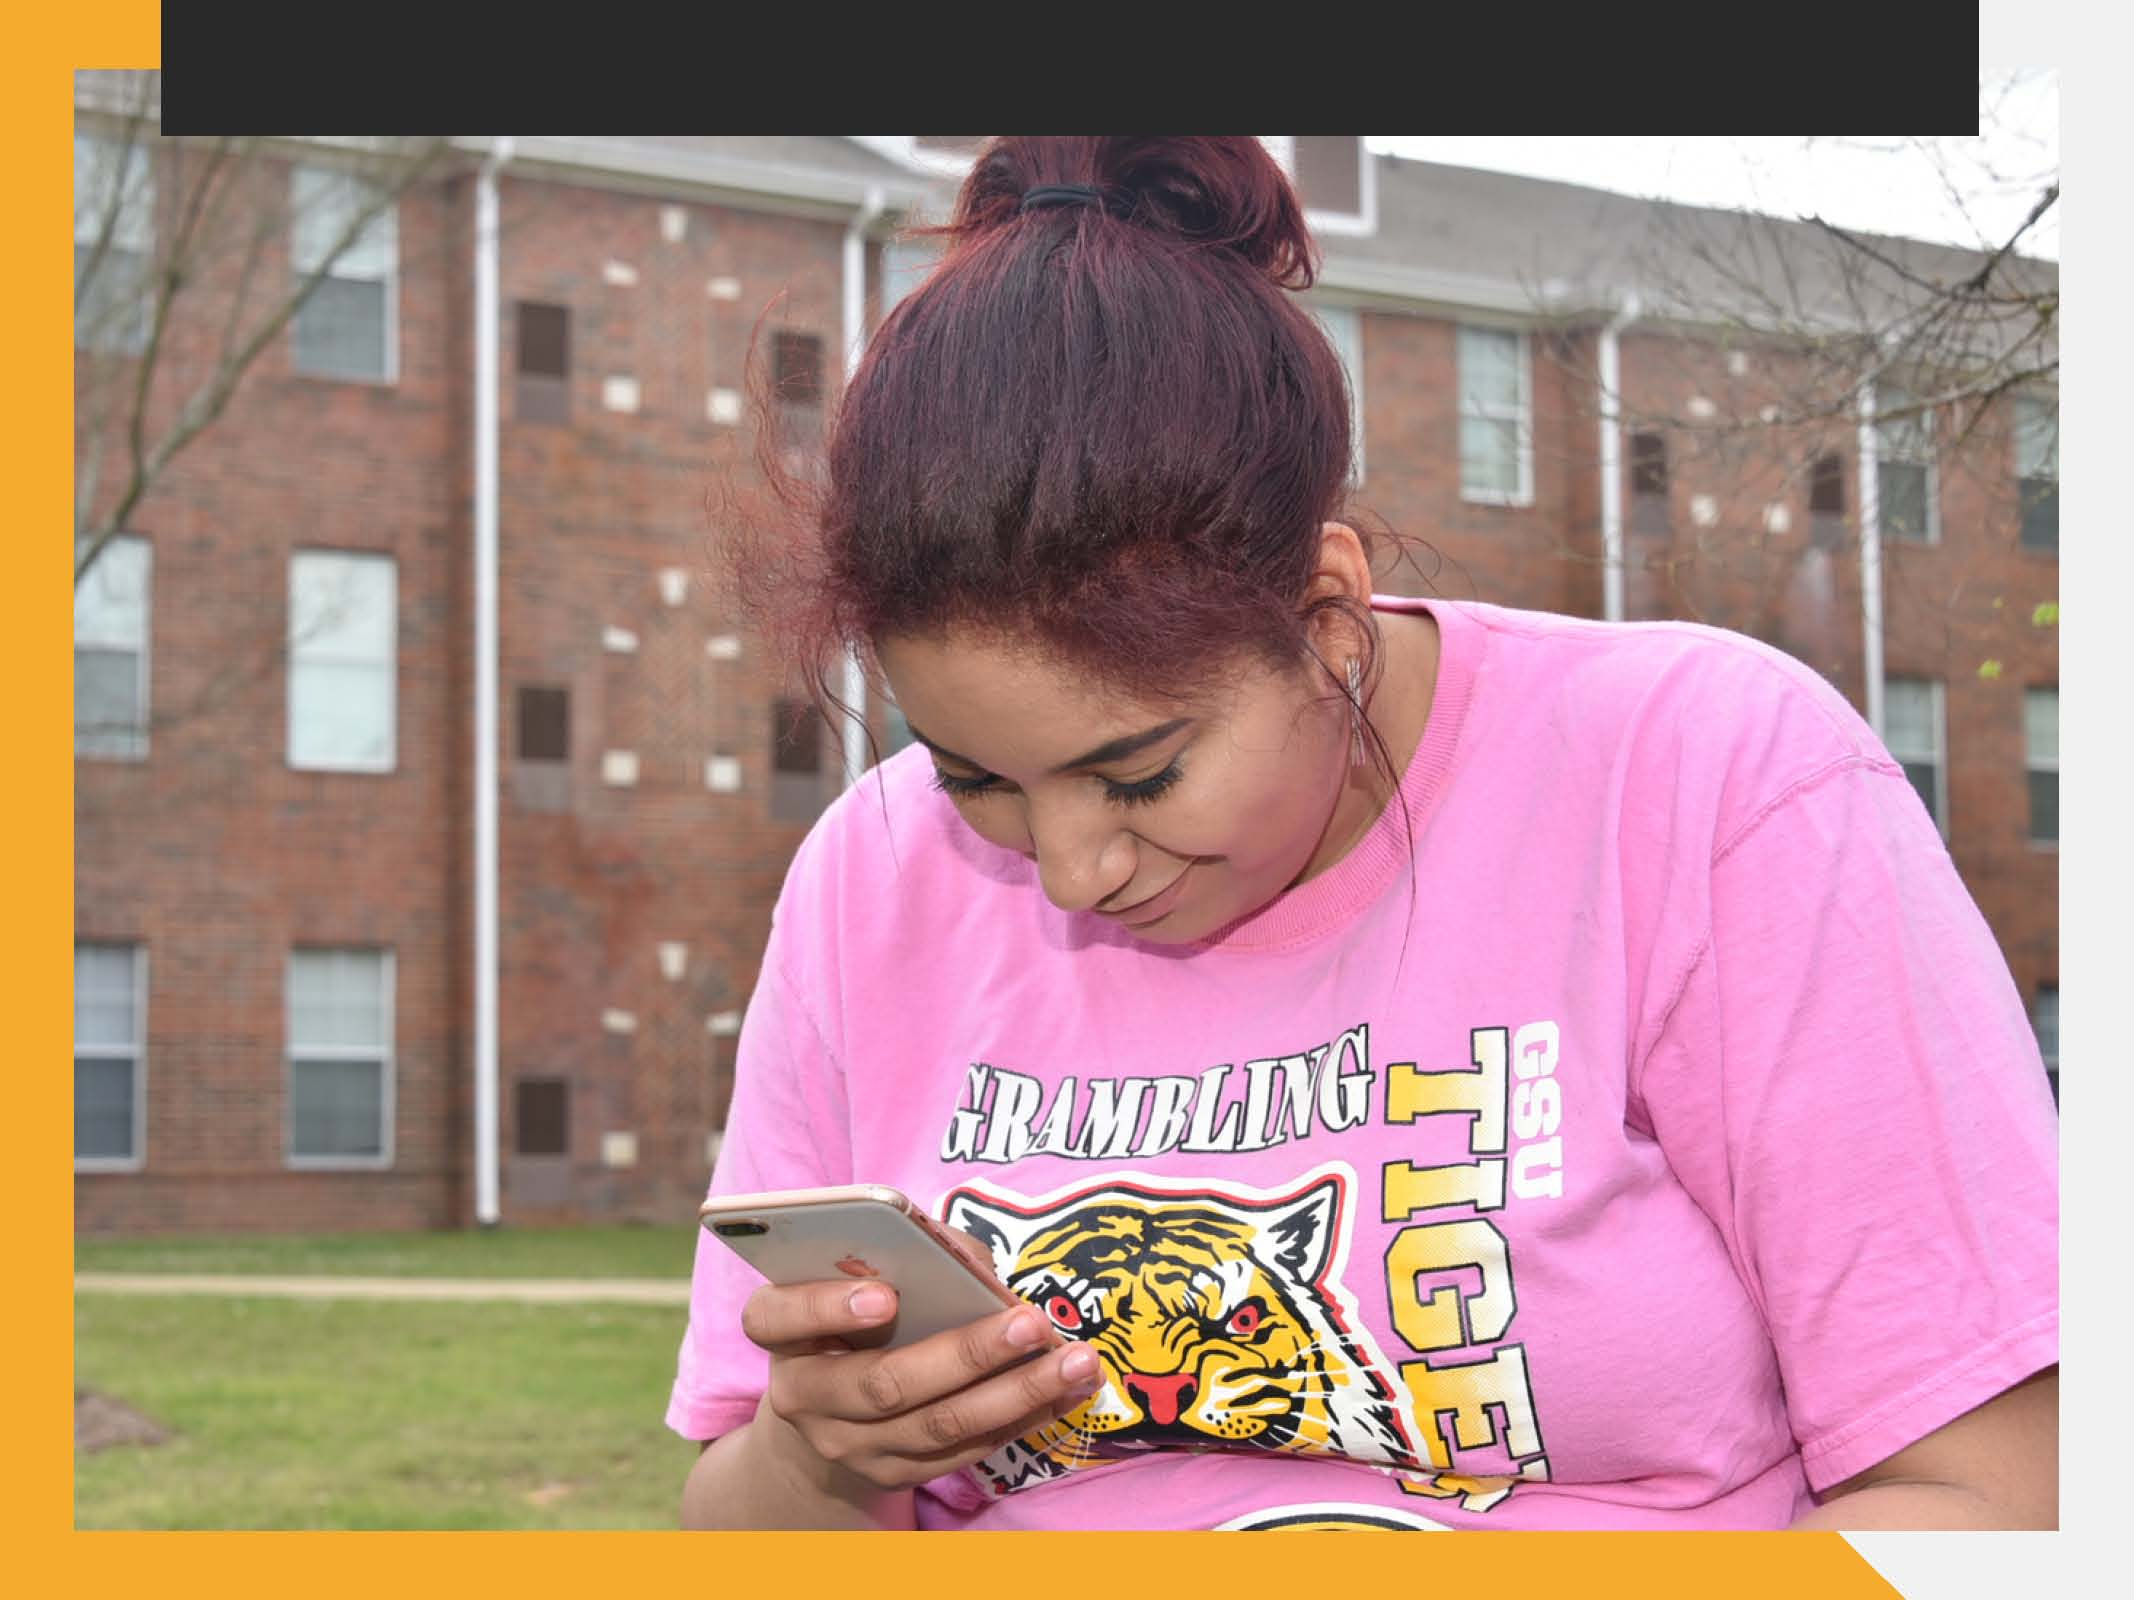 GSU Student on phone photo